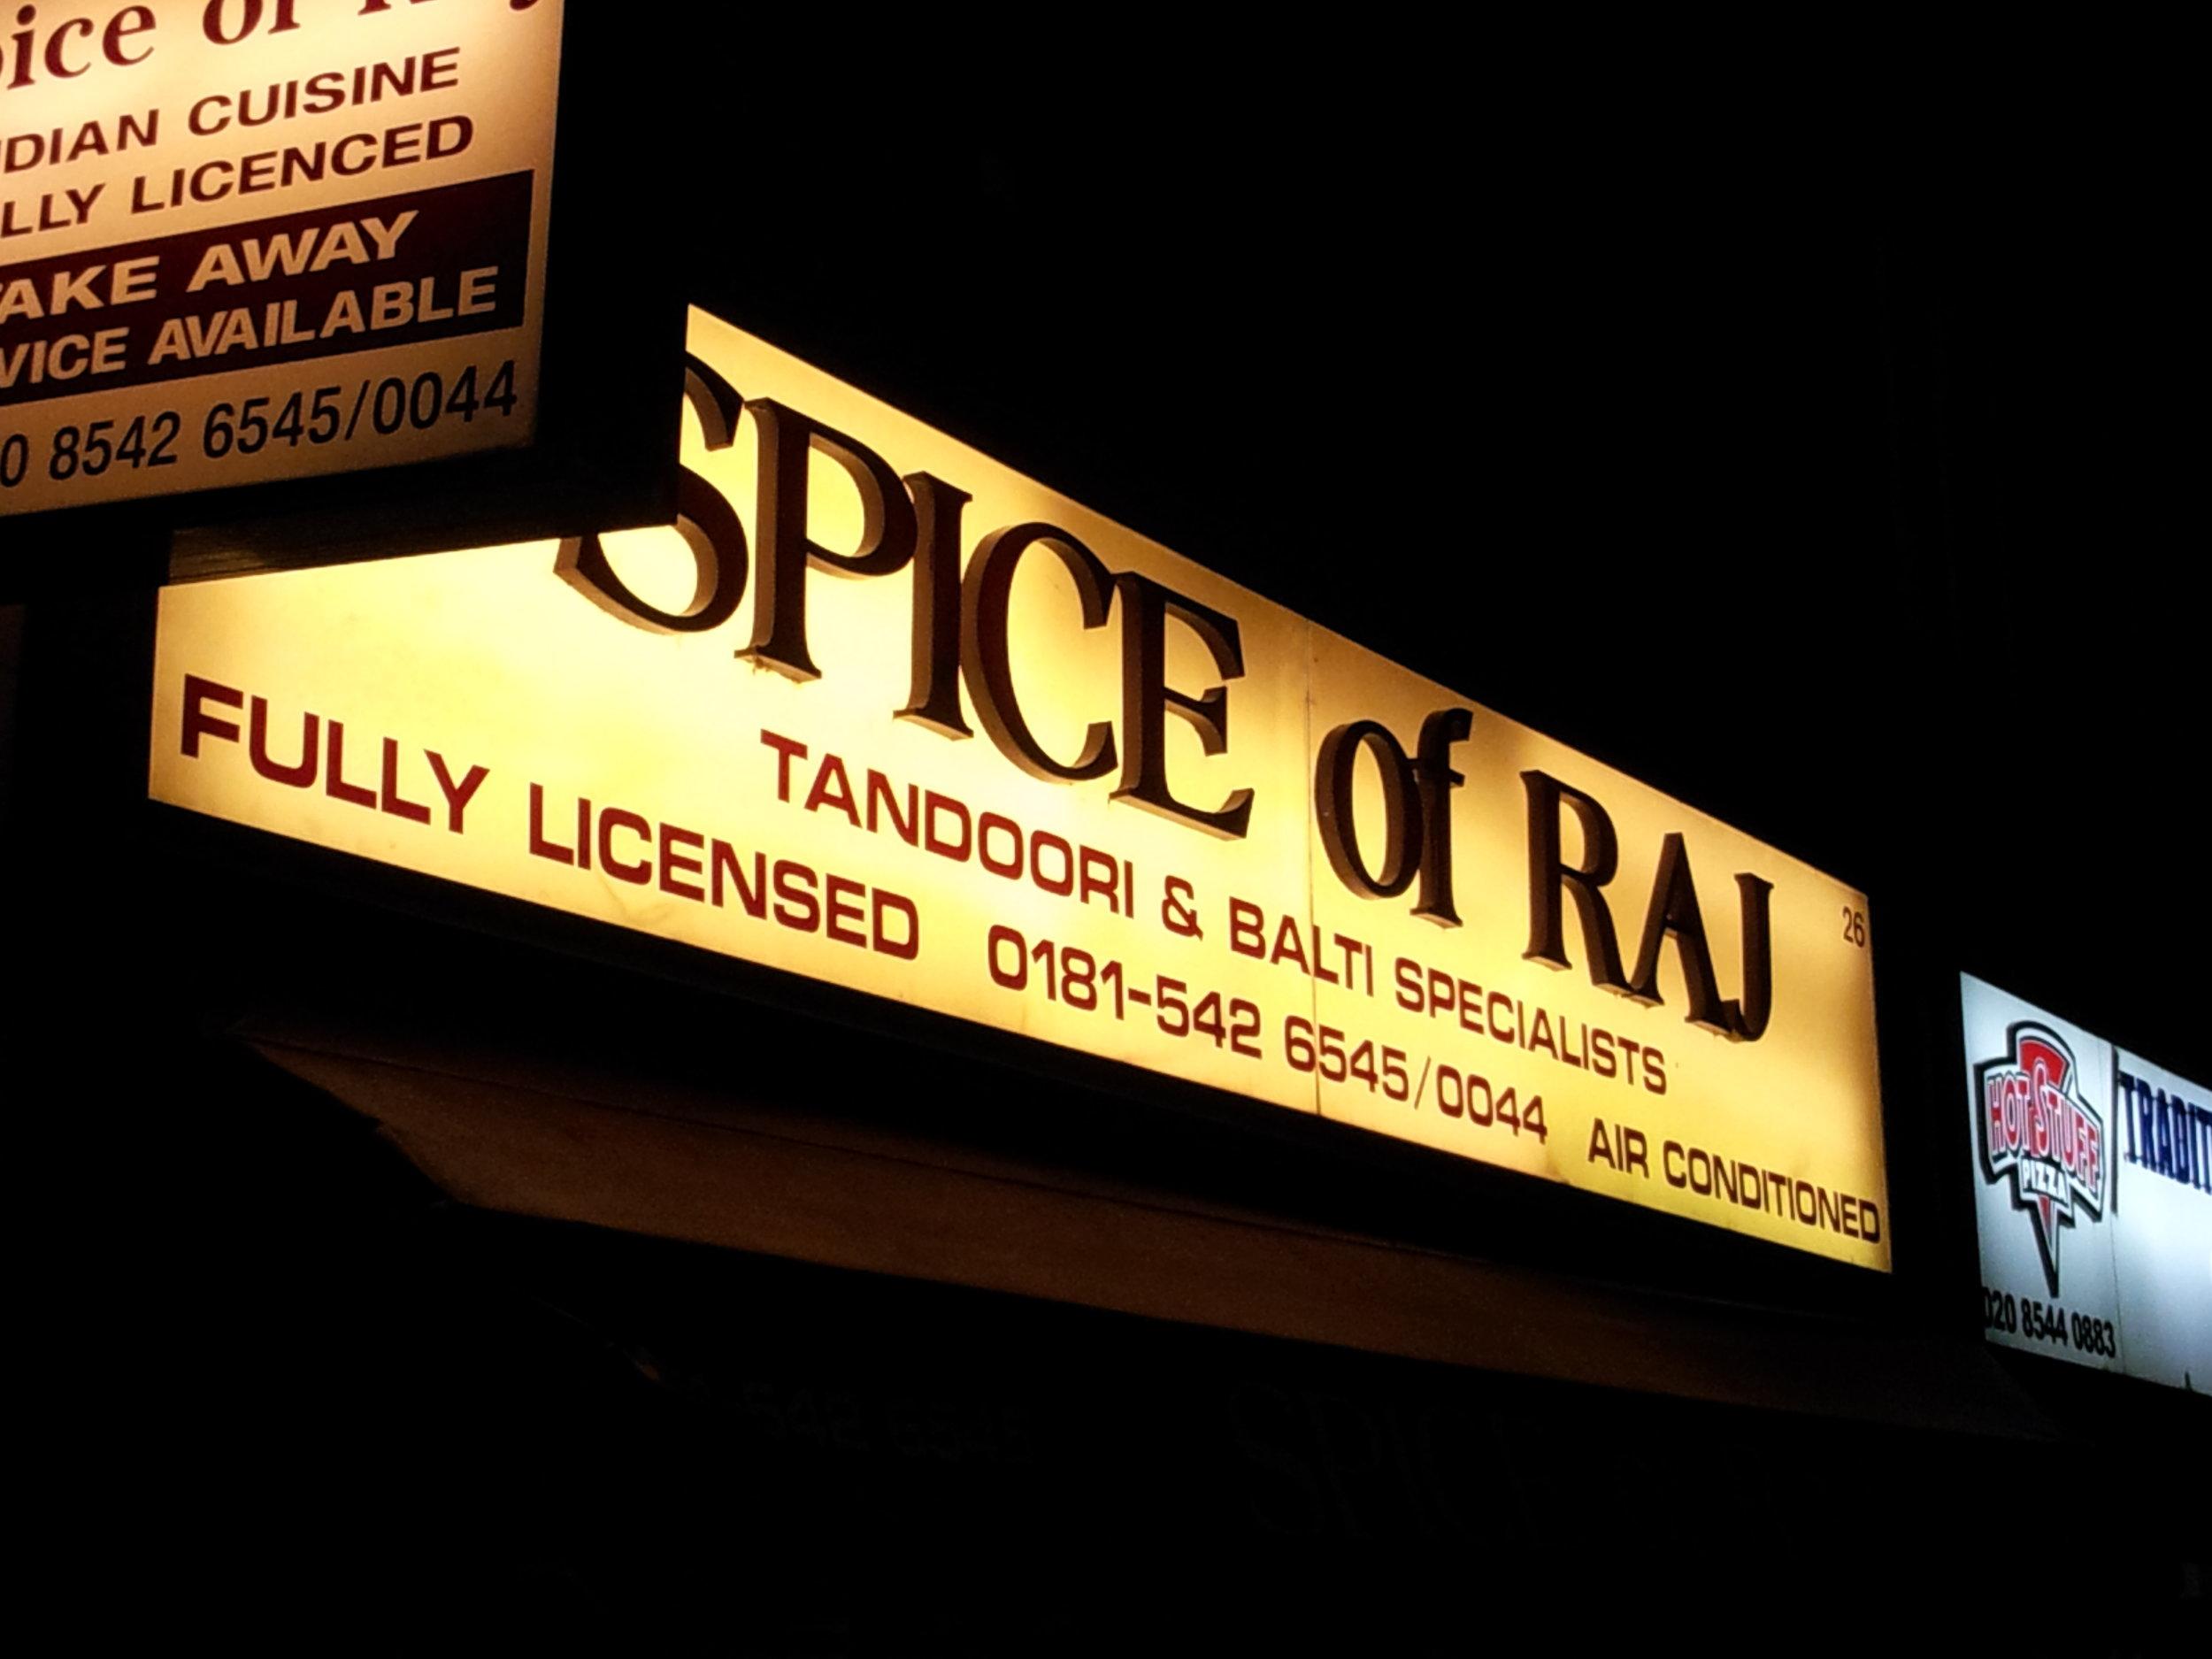 Spice Of Raj.jpg